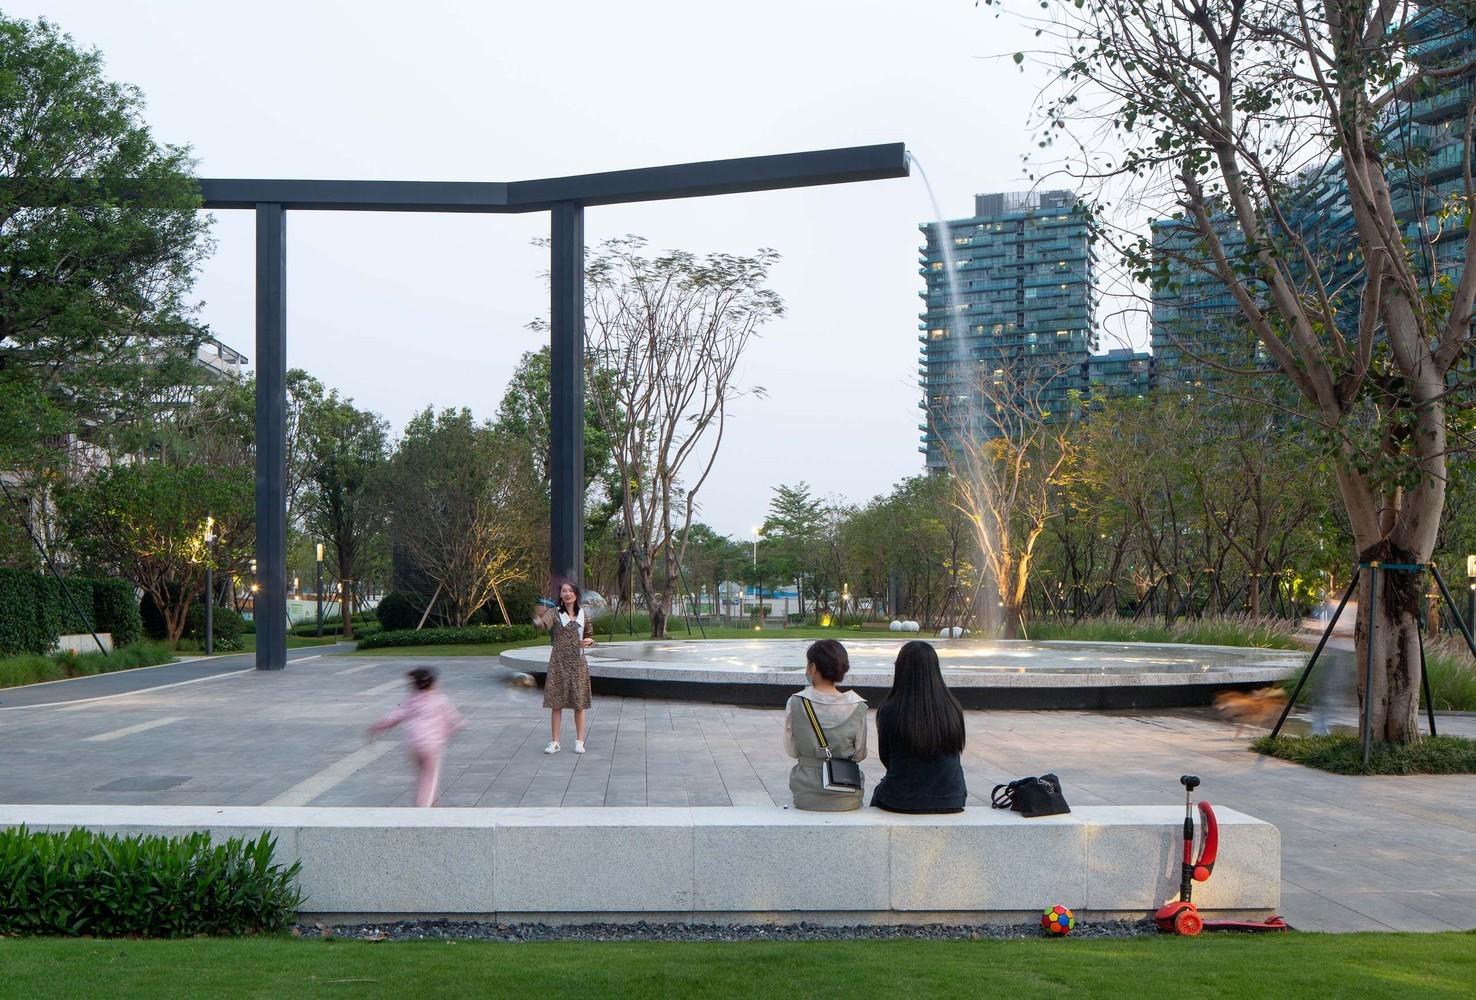 Consejos para aprovechar el agua de lluvia en proyectos de arquitectura,Shenzhen Shenwan Street Park / AUBE CONCEPTION. Image © Tianpei Zeng